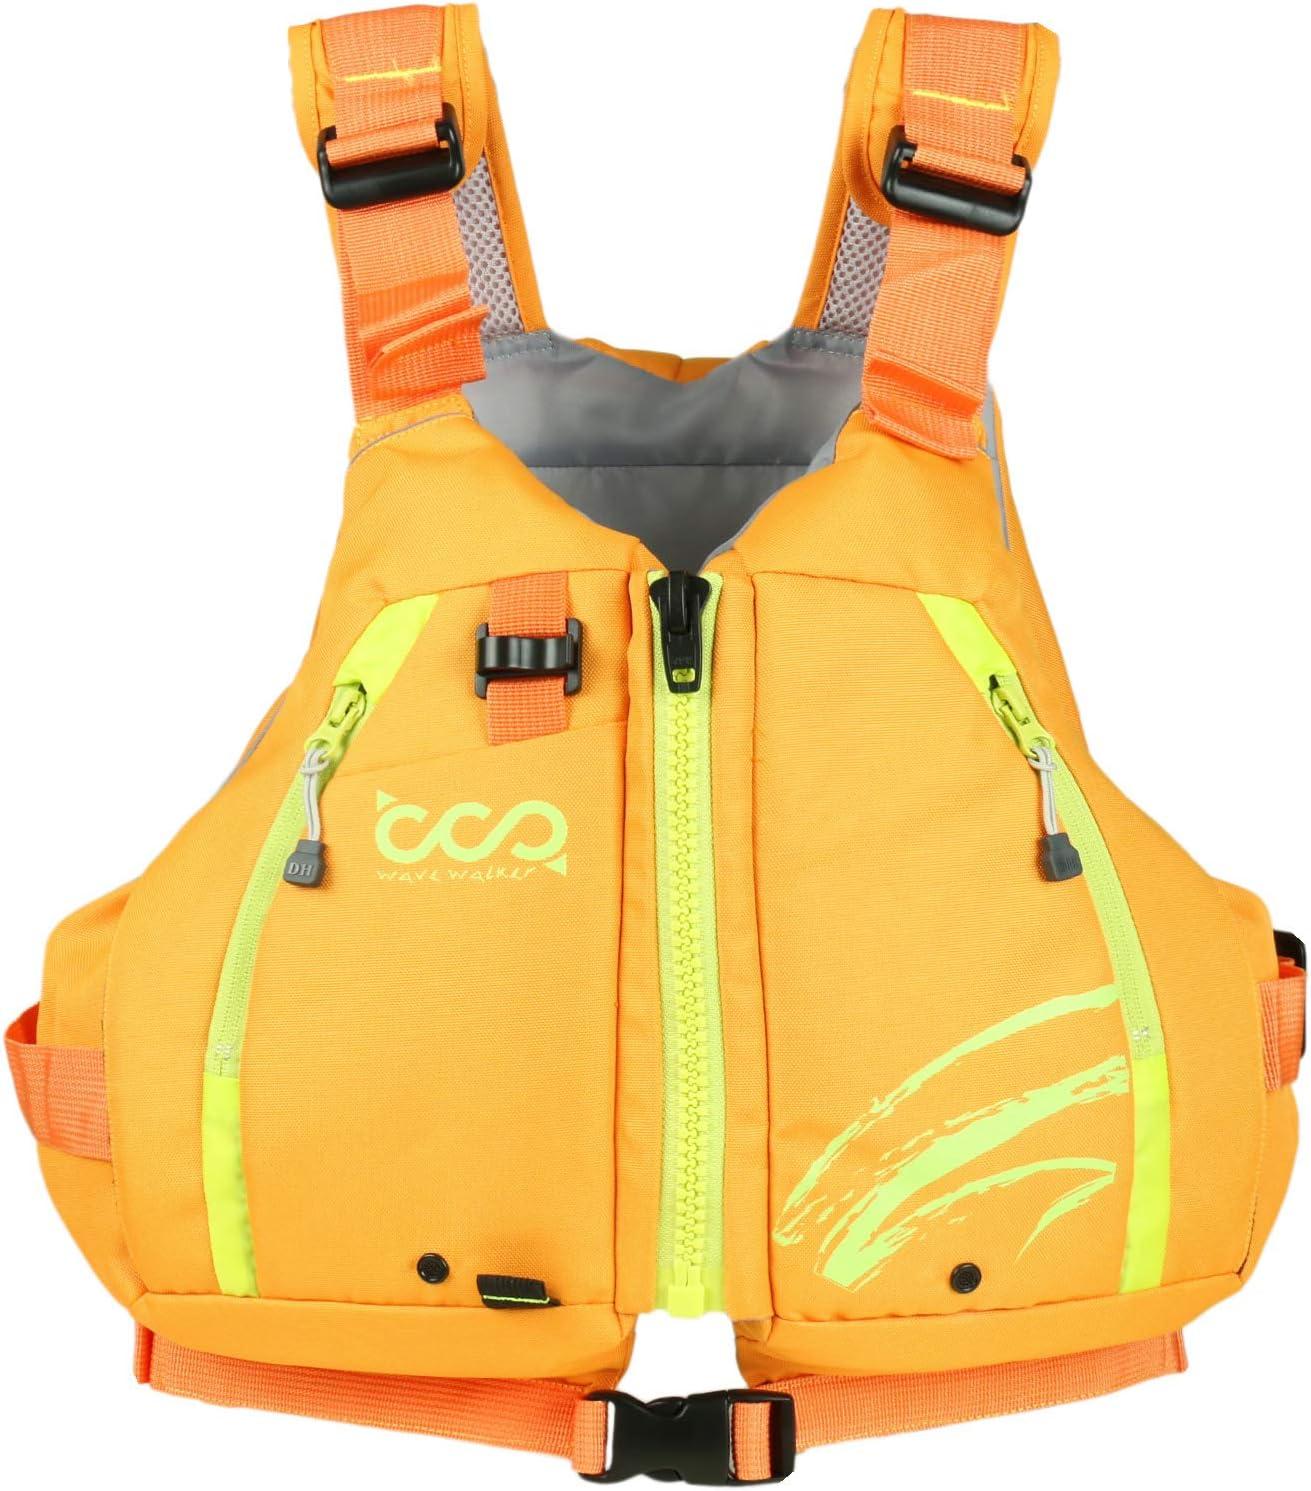 Boglia Swim Vest PVC Translated Jacket Inexpensive for Floation w Adult Swimsuit